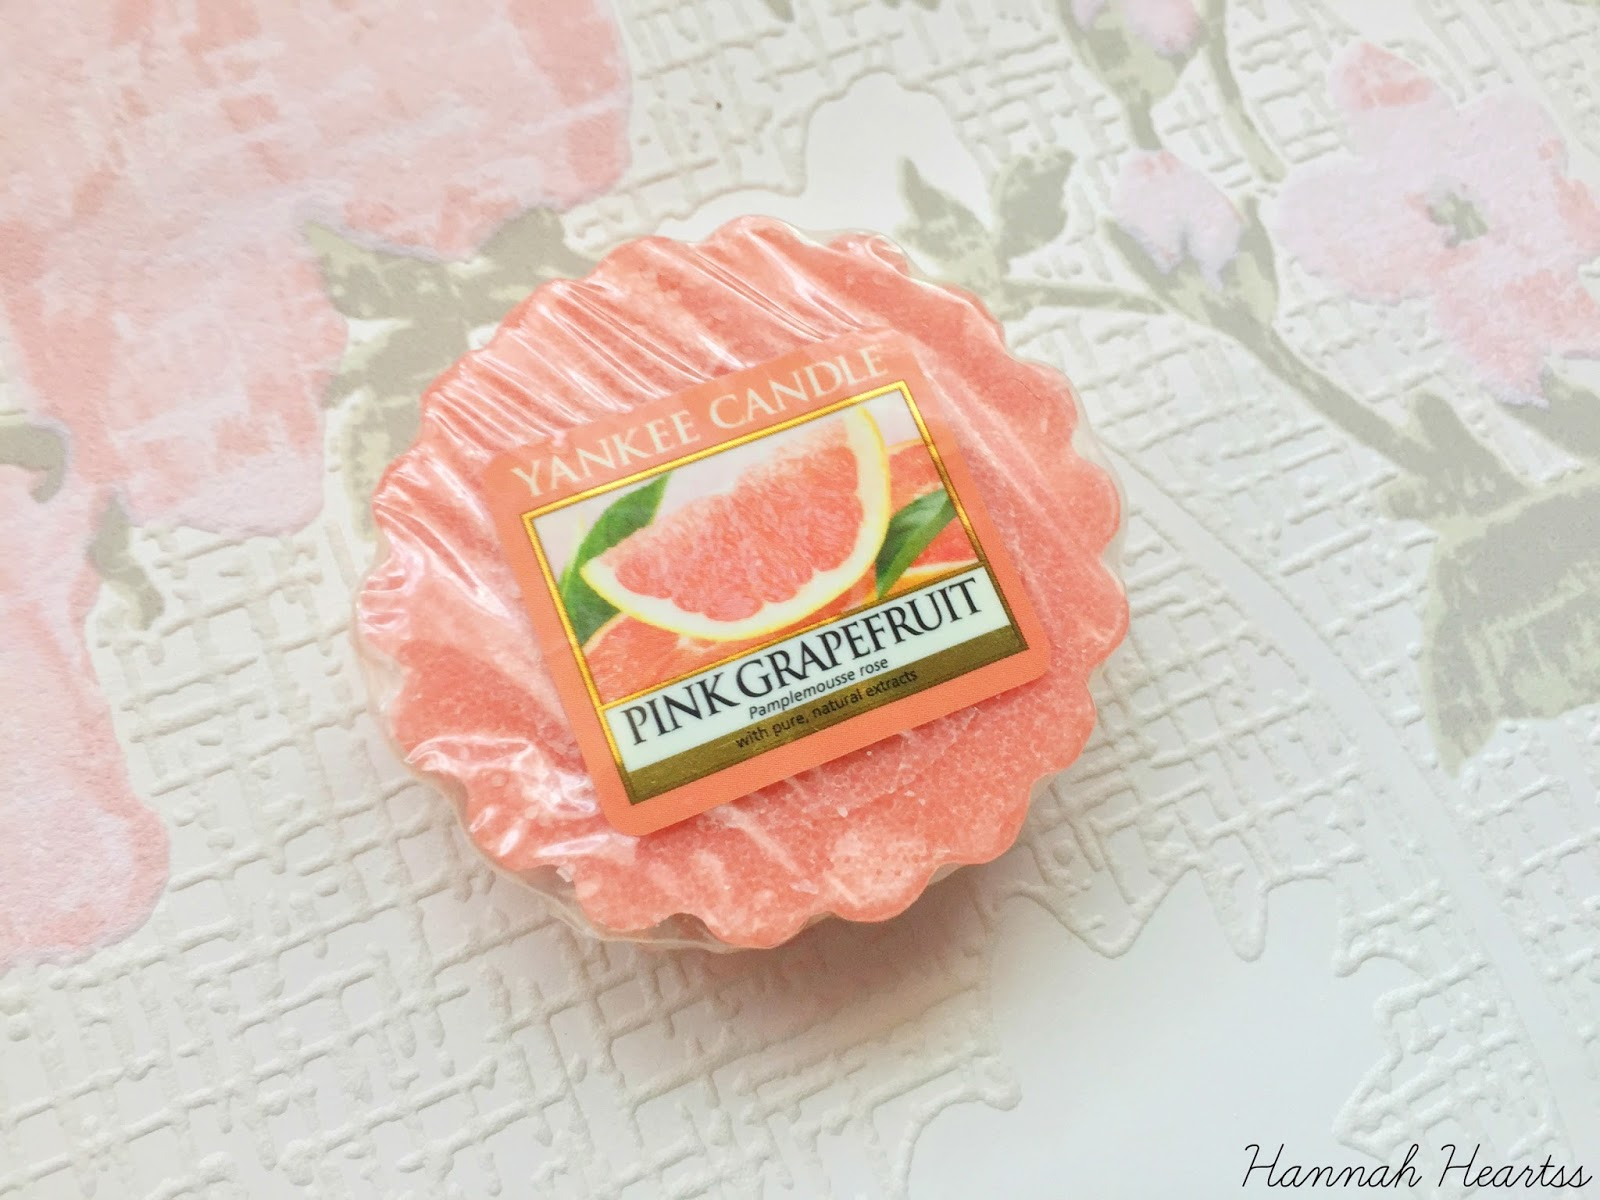 Yankee Candle Pink Grapefruit Tart